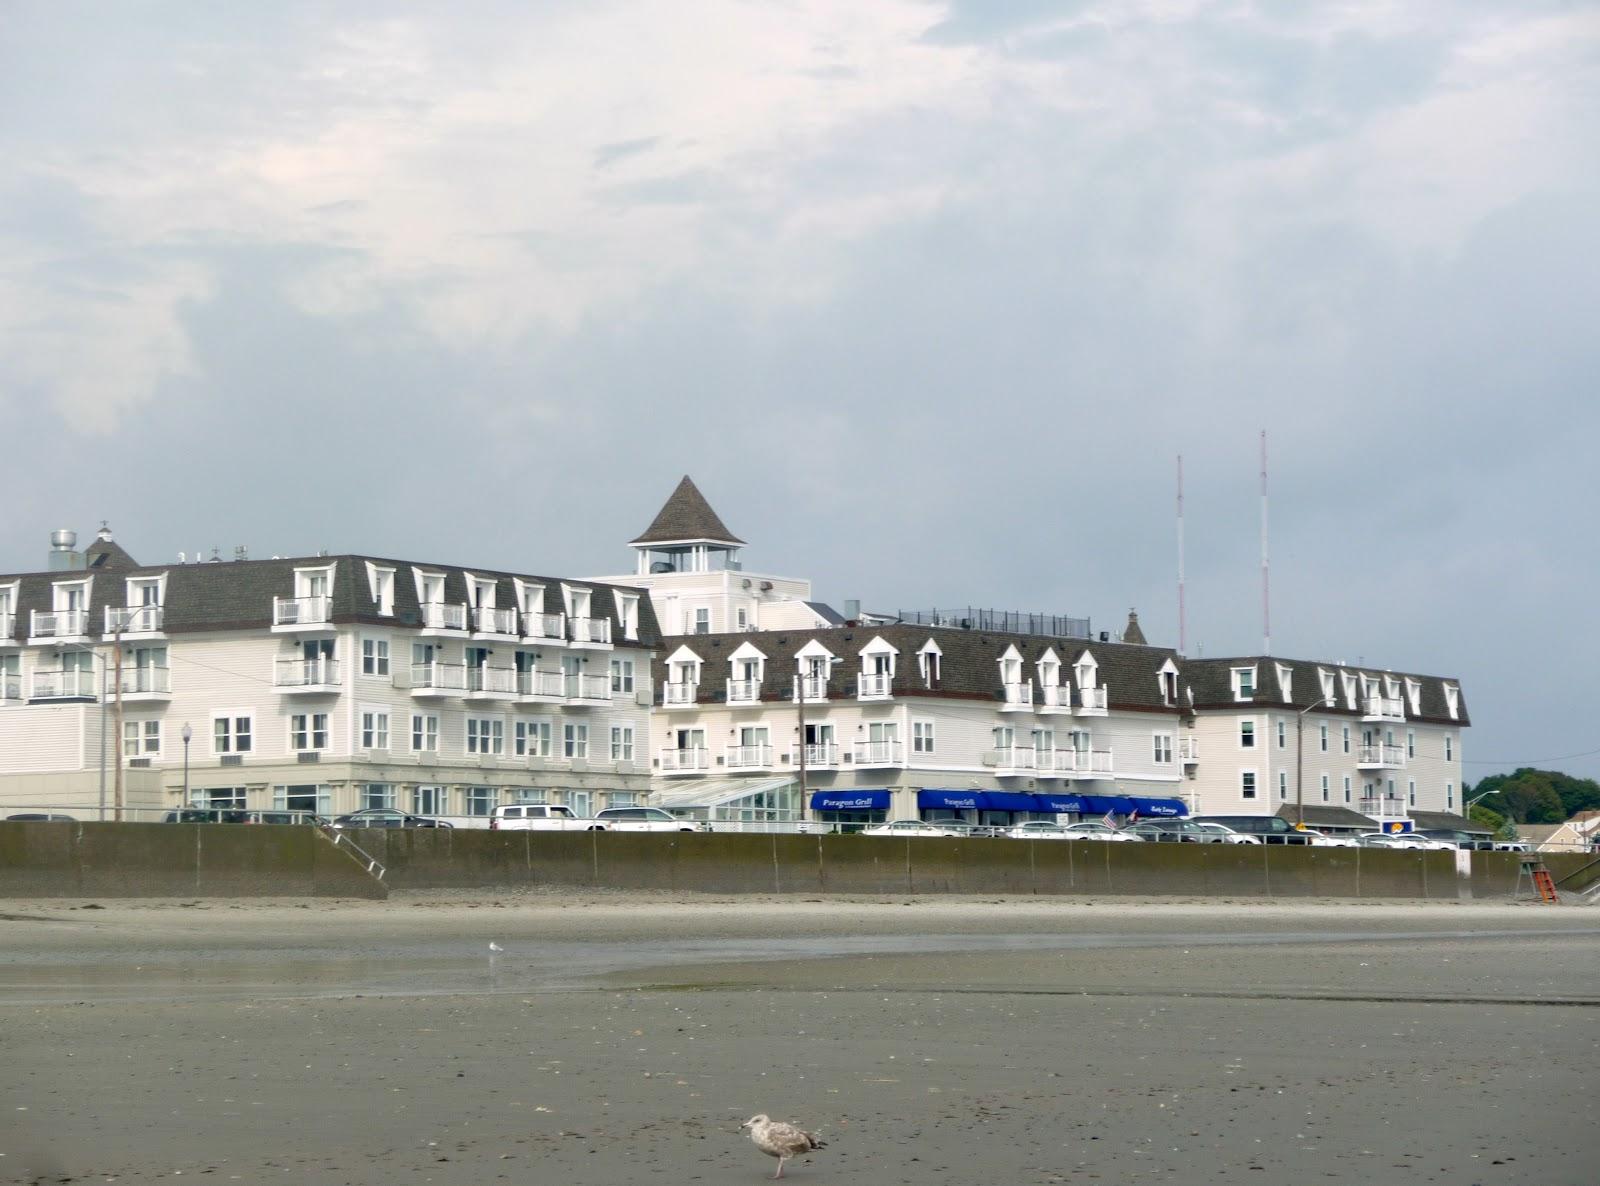 Nantasket Beach Hotel